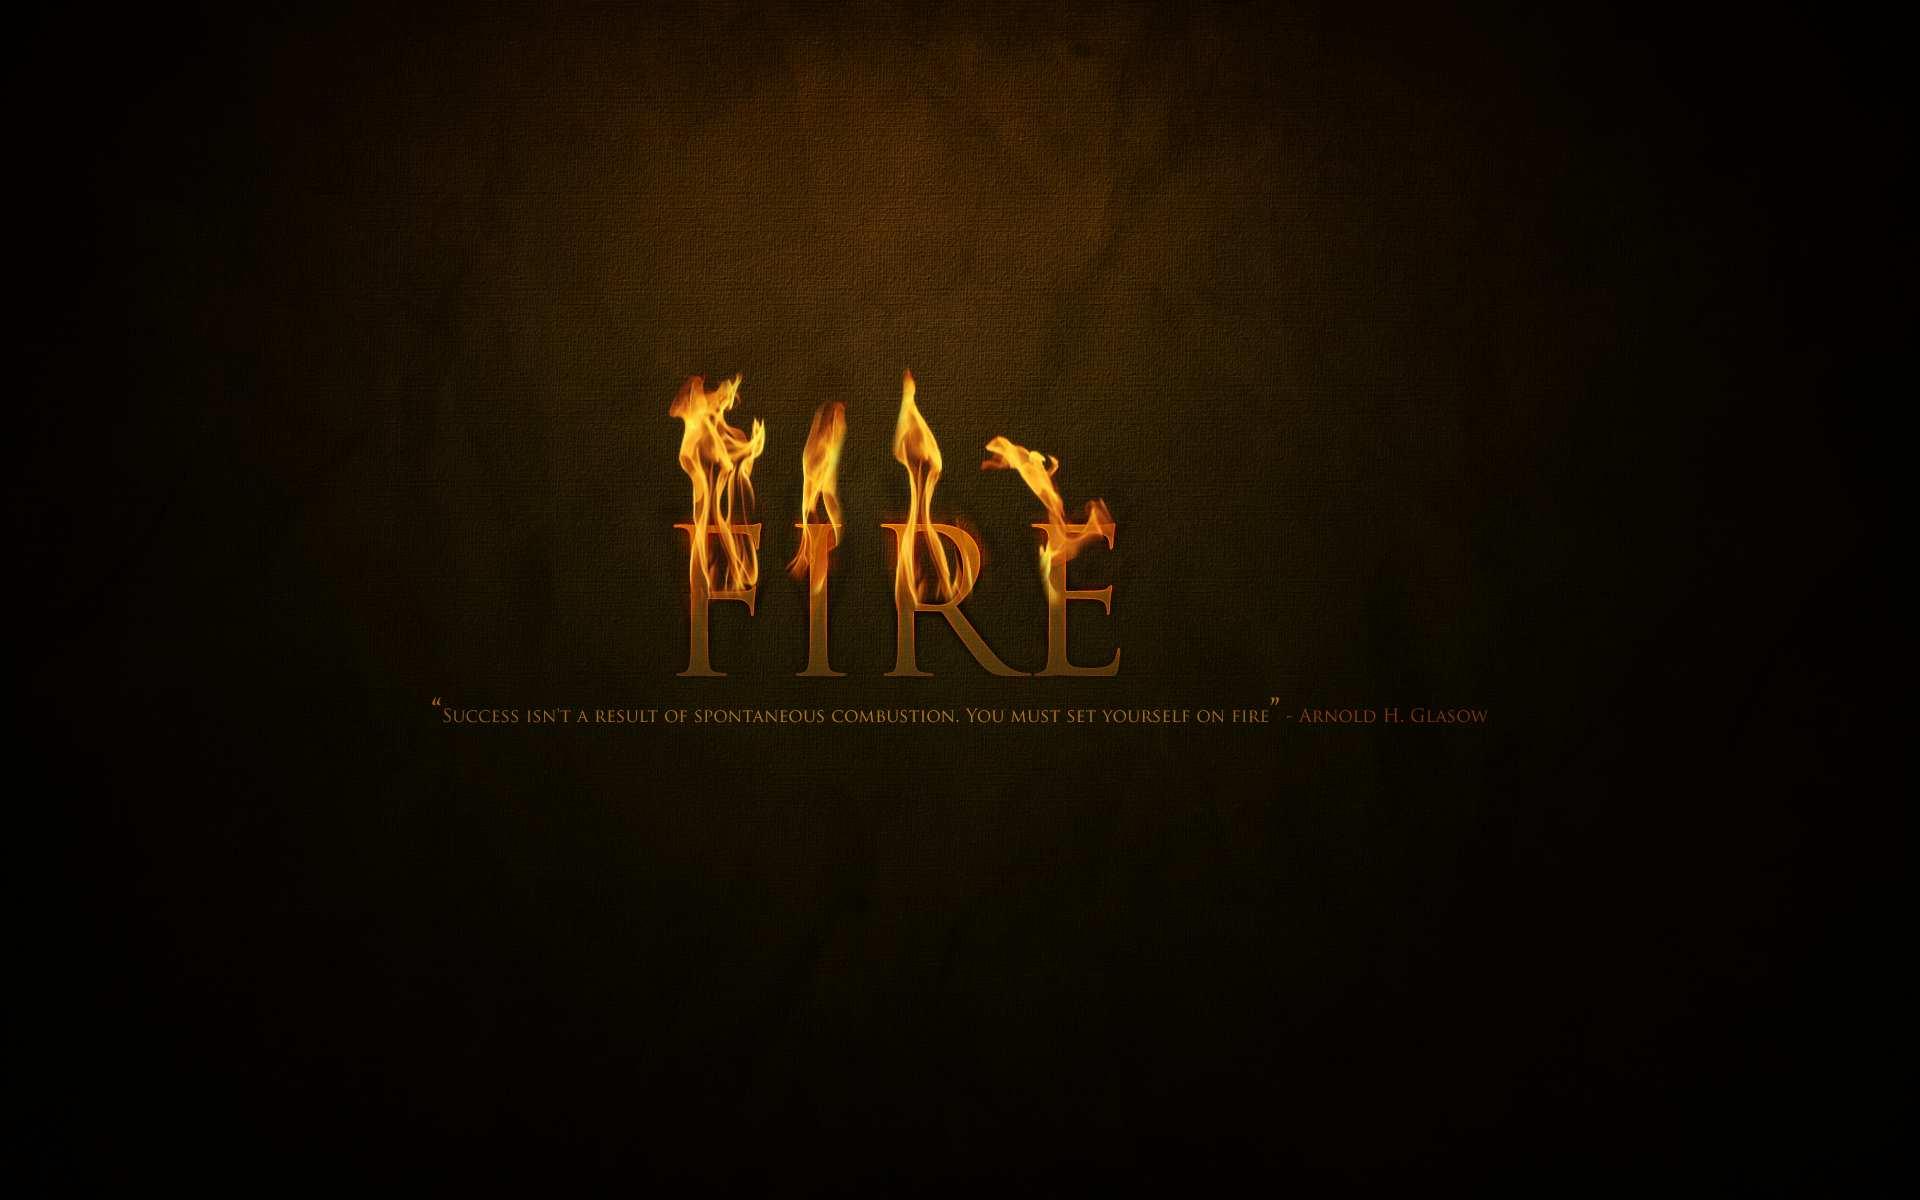 Fire Wallpaper Quotes Hd Desktop Wallpapers 4k Hd